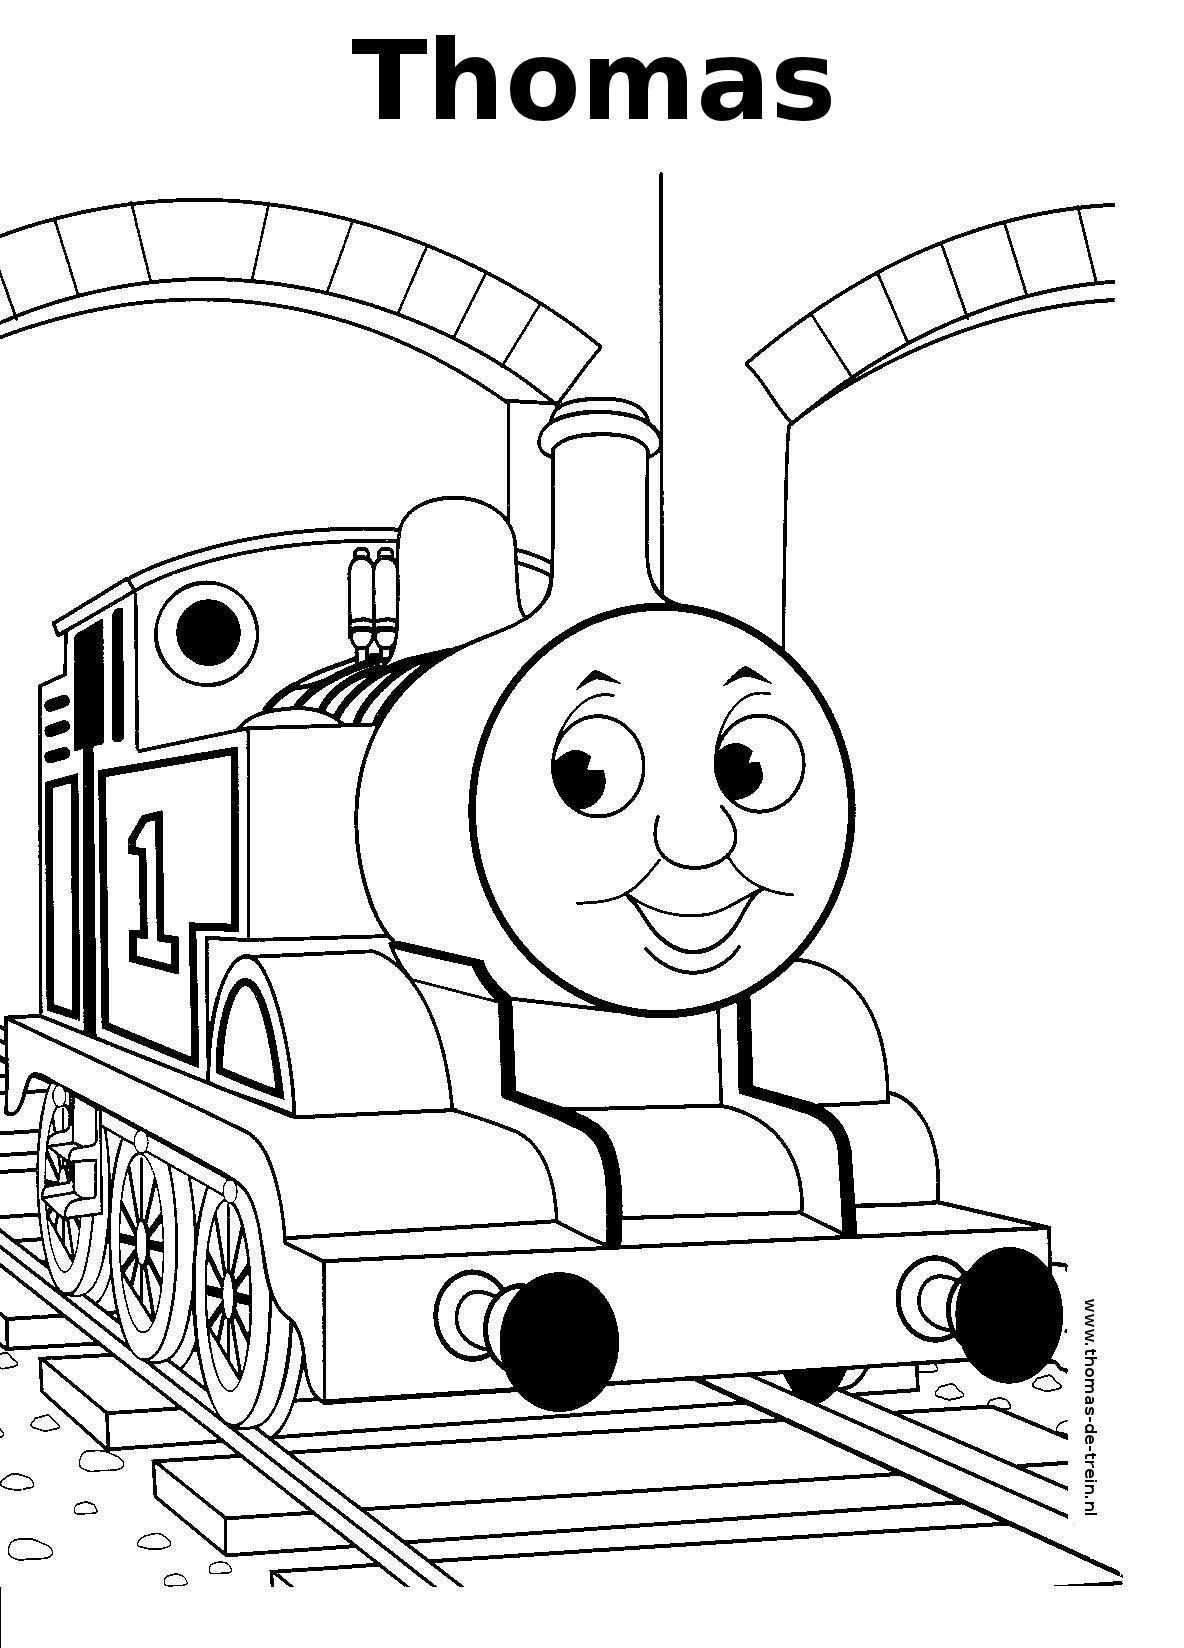 Free Printable Train Coloring Pages For Kids Kleurplaten Thomas